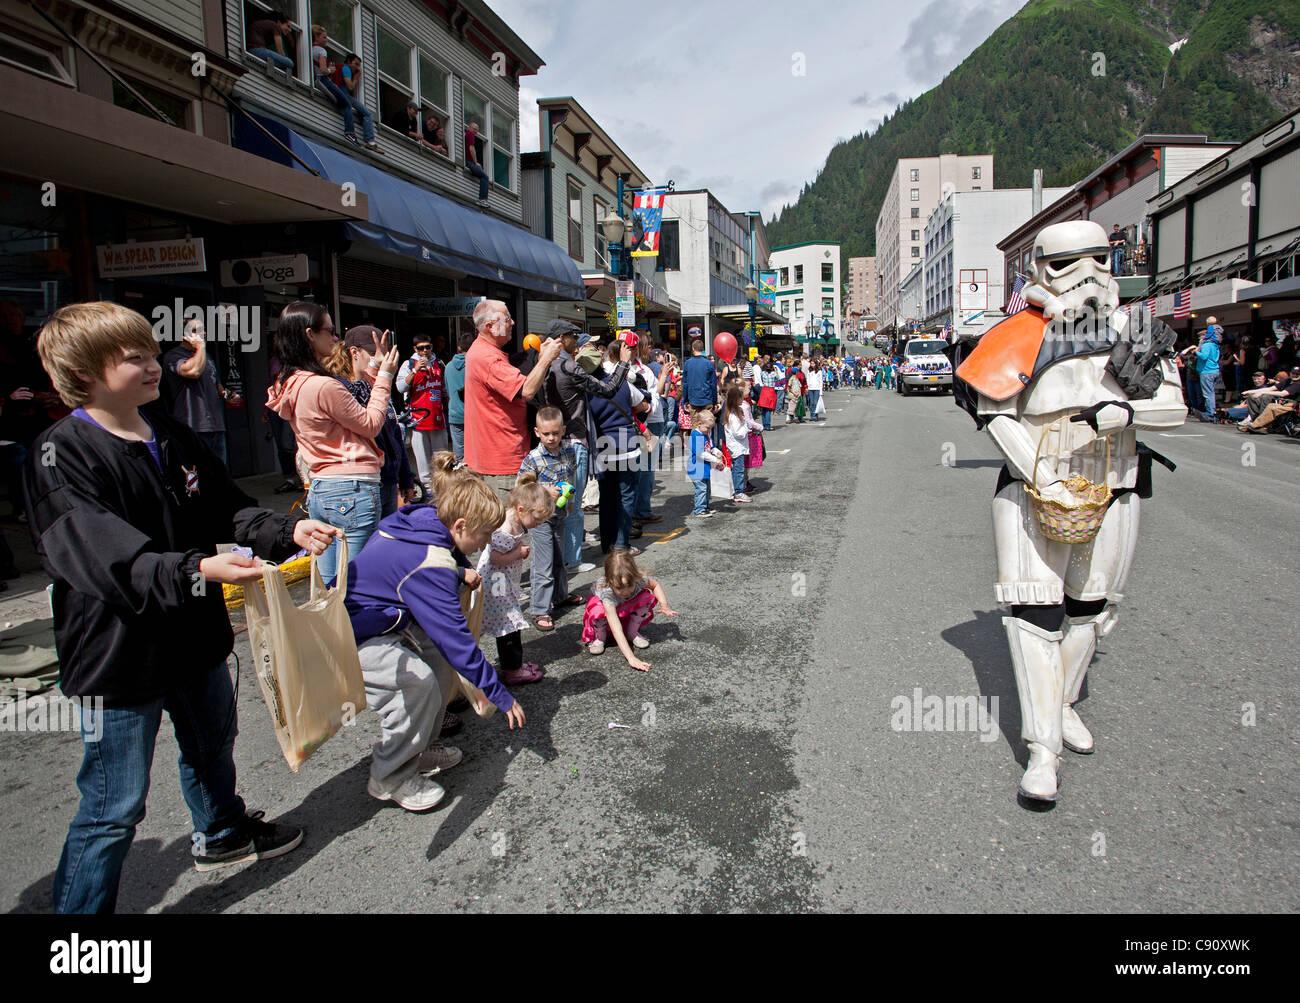 Homme avec star wars déguisement. 4 juillet parade. Juneau. De l'Alaska. USA Photo Stock